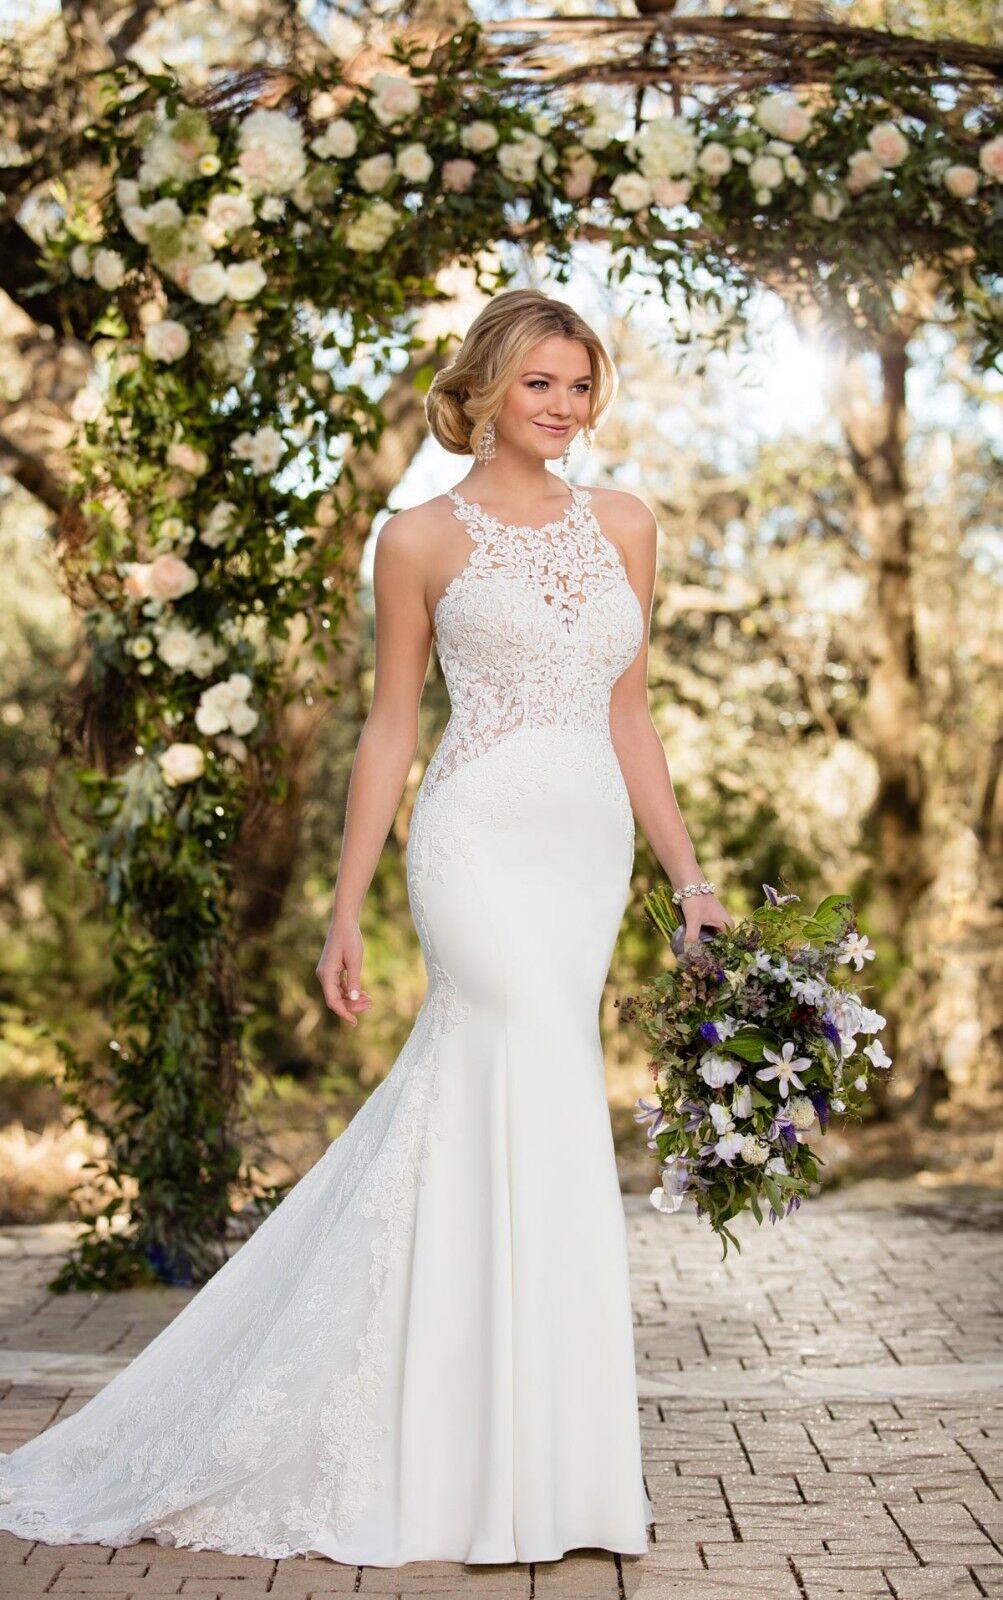 BNWT Essense of Australia ivory lace and crepe wedding dress size 14 RRP